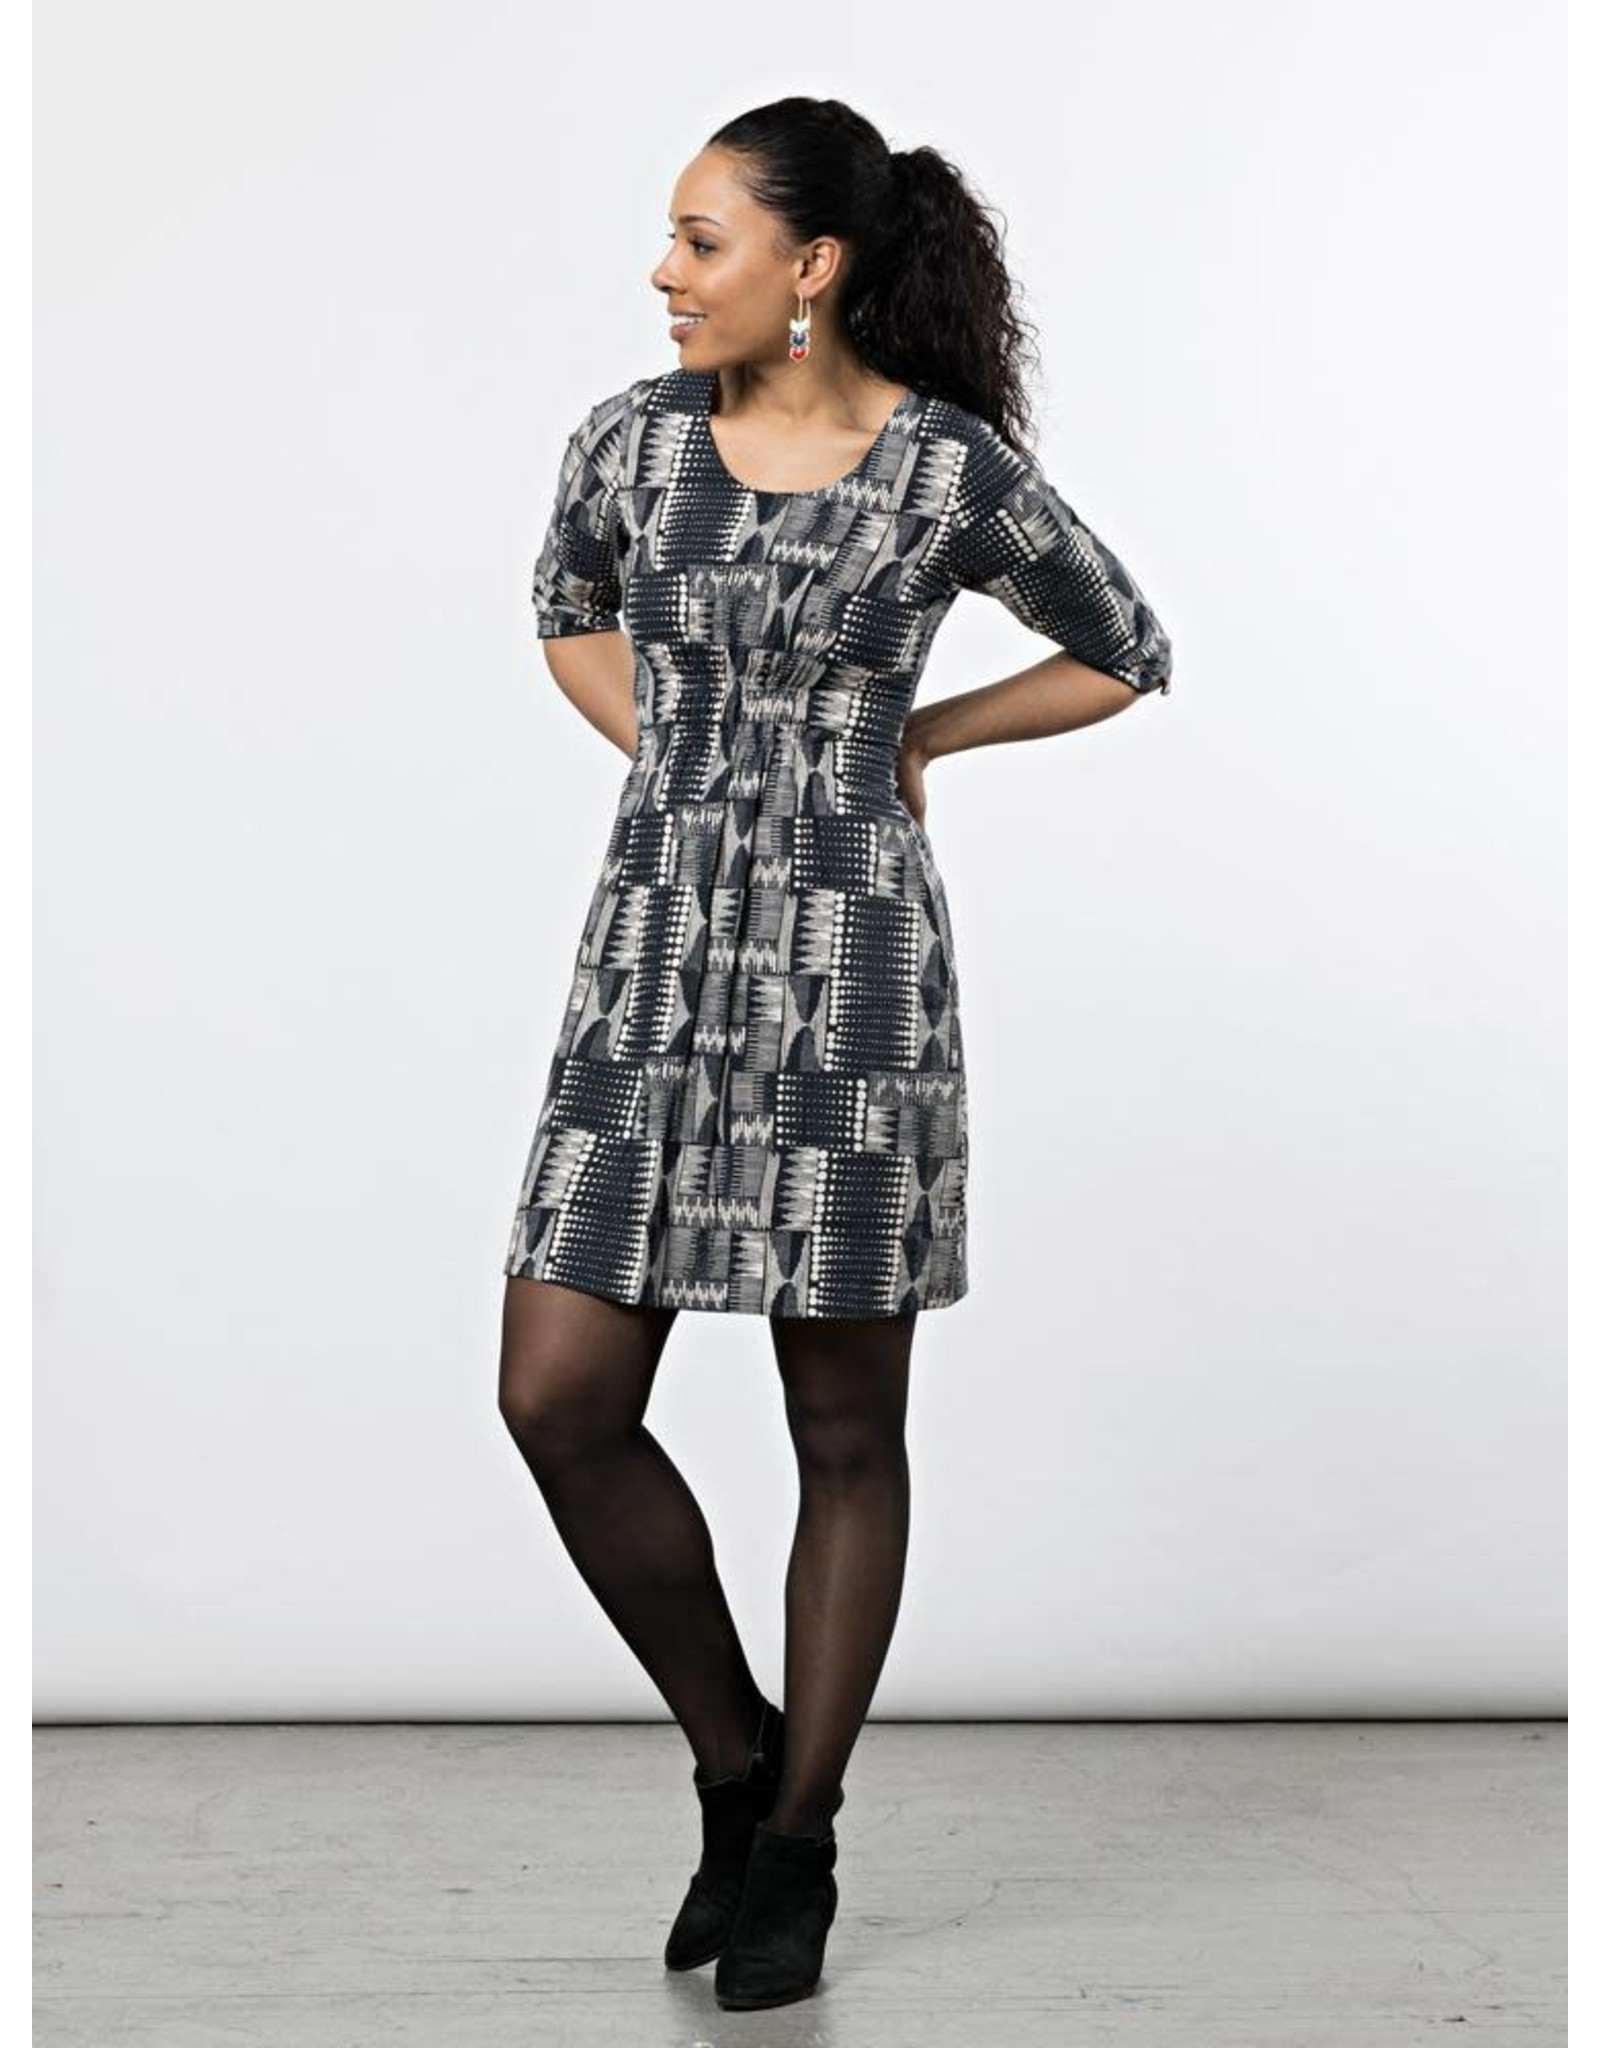 CLEARANCE Annabelle Dress Black Geo